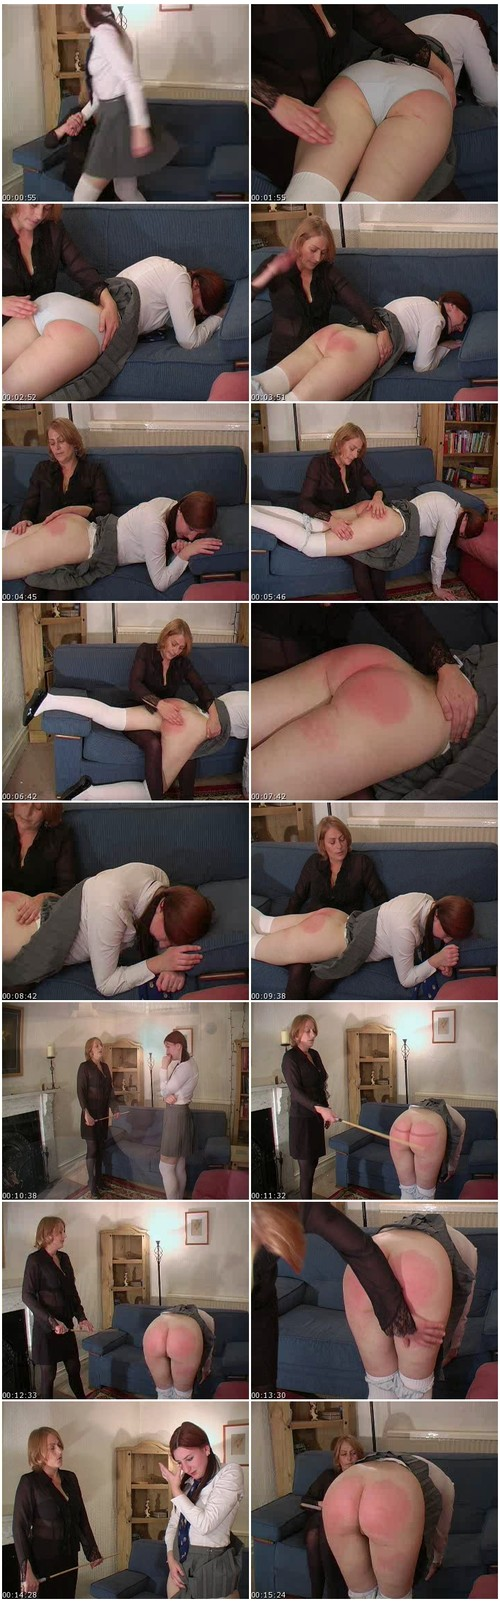 spanking140_thumb_m.jpg